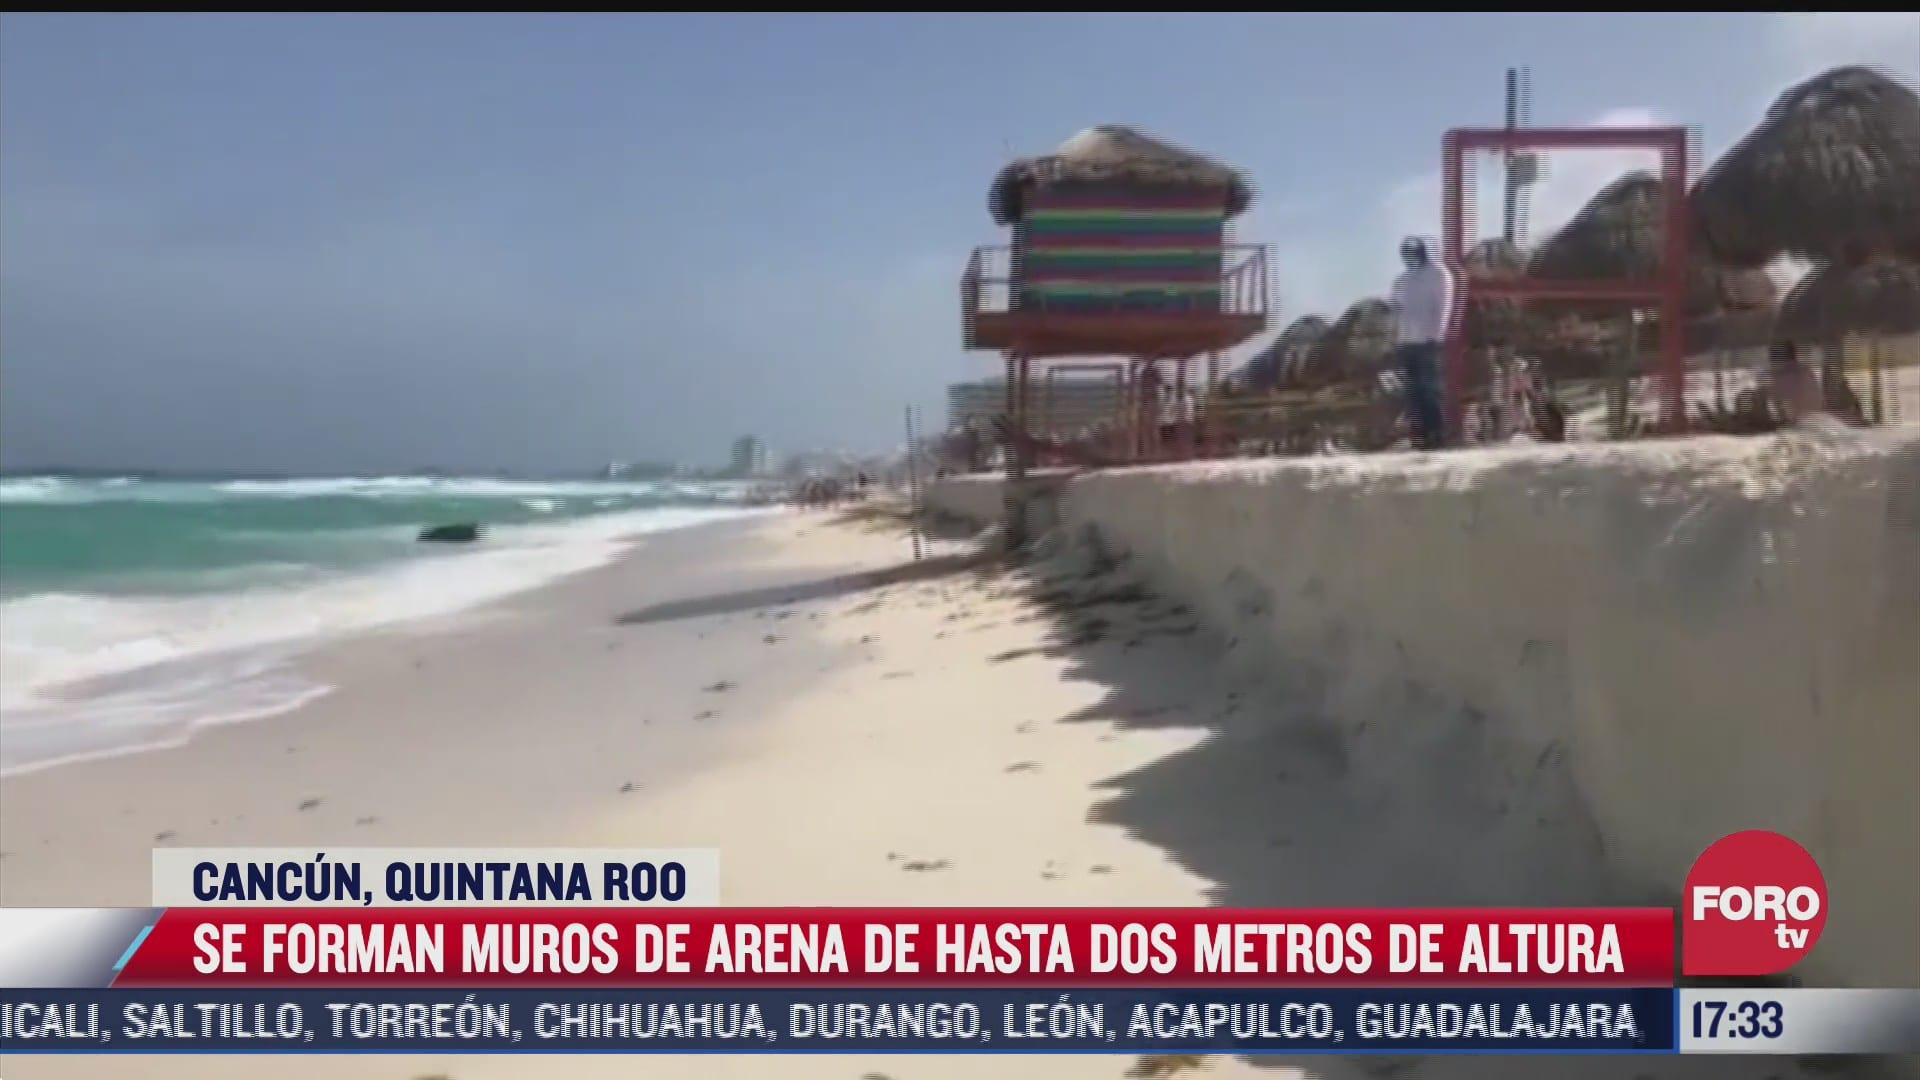 se forman muros de arena de hasta dos metros de altura en cancun